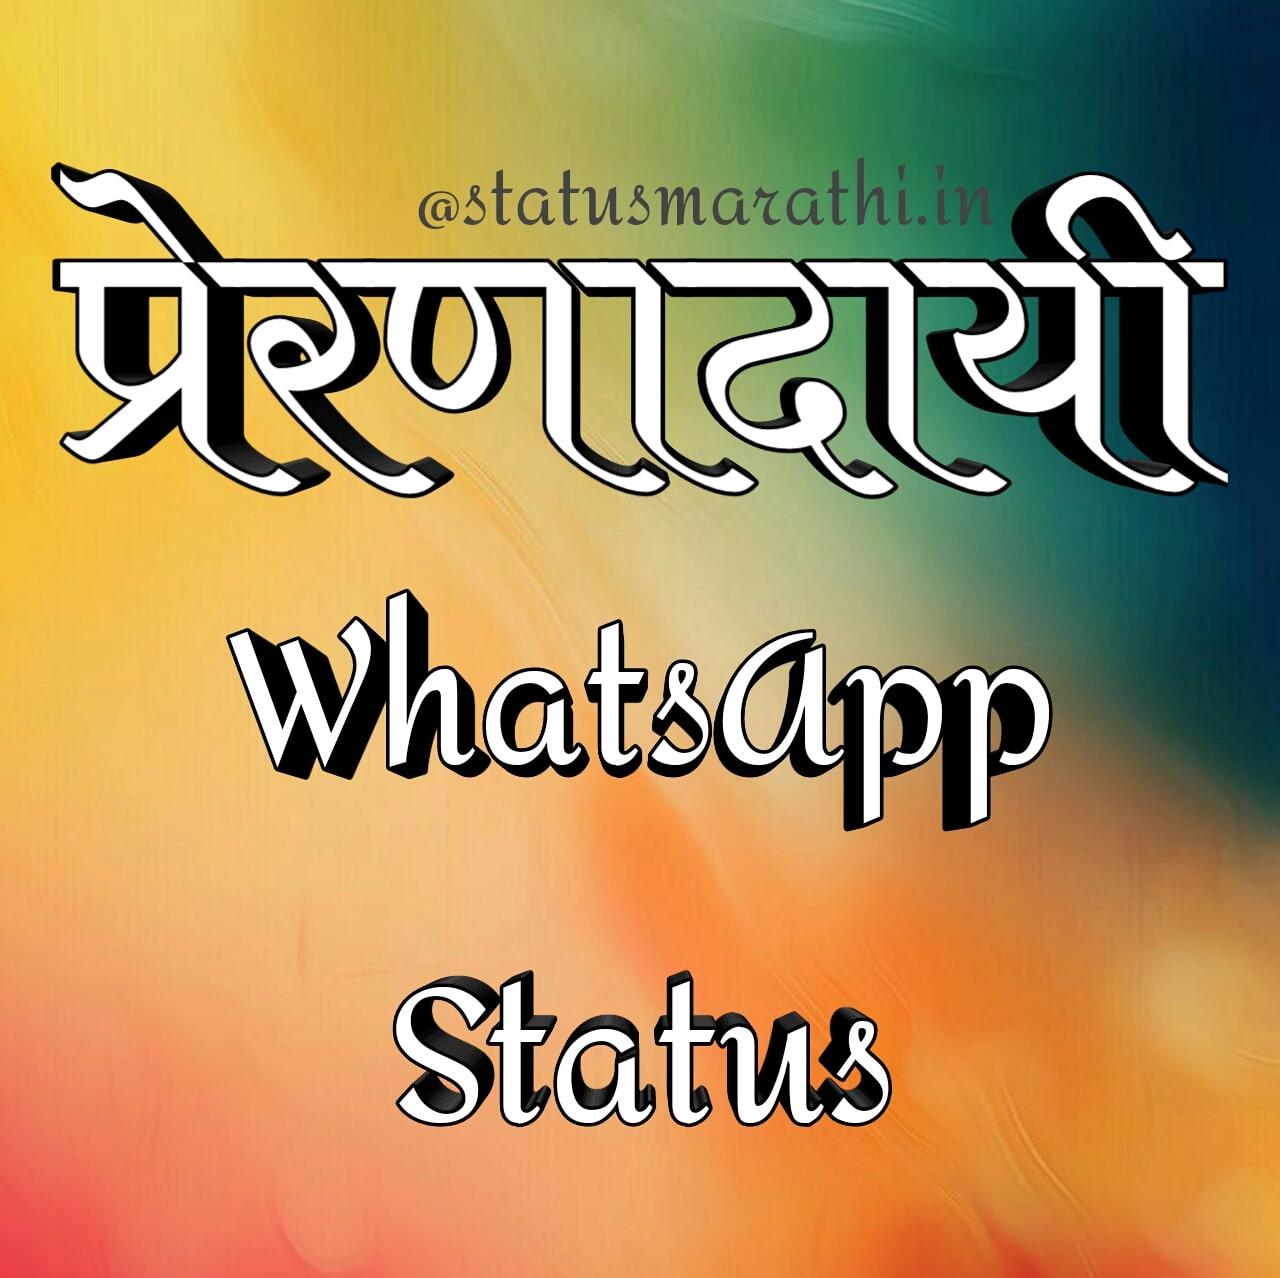 Life Status For WhatsApp: Best inspirational status in marathi language